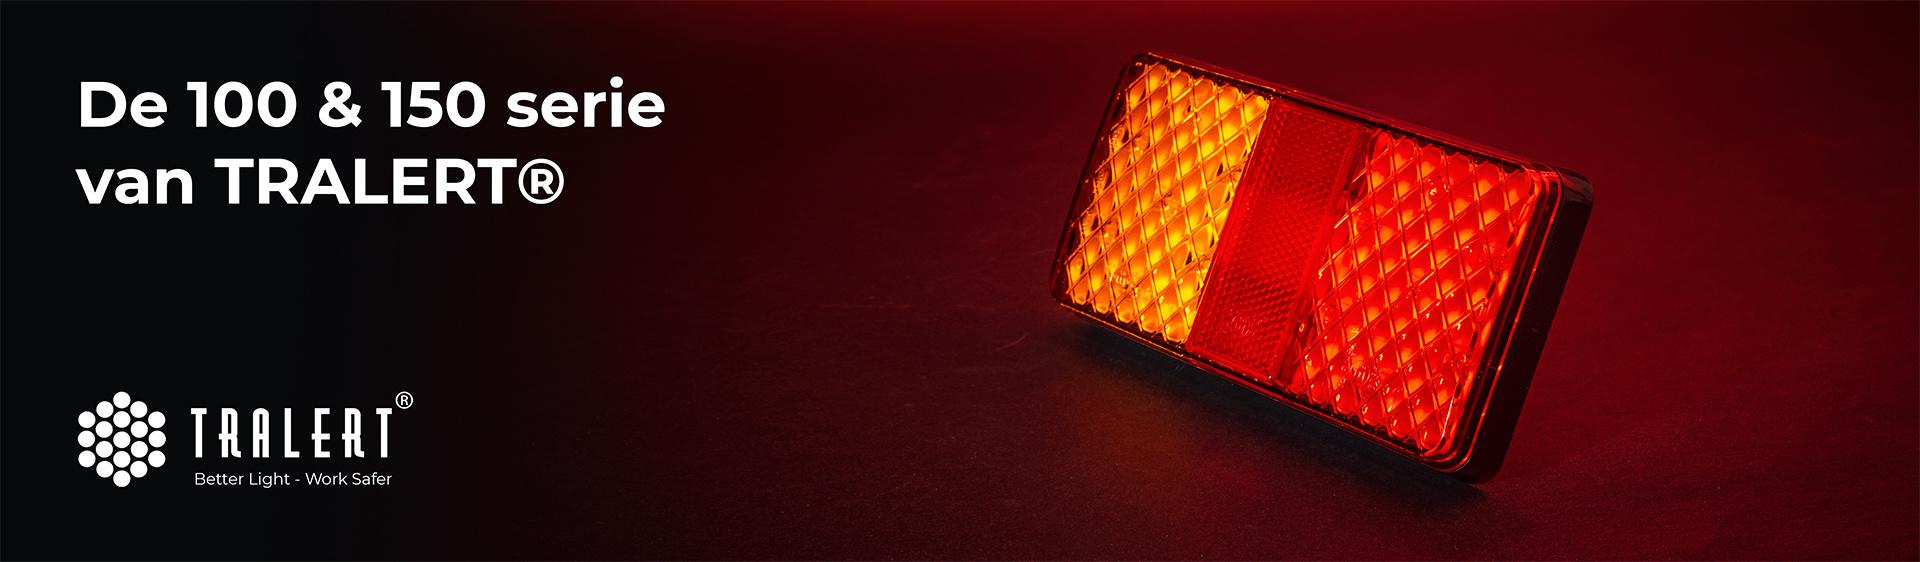 Tralert 100 en 150 serie LED achterlichten